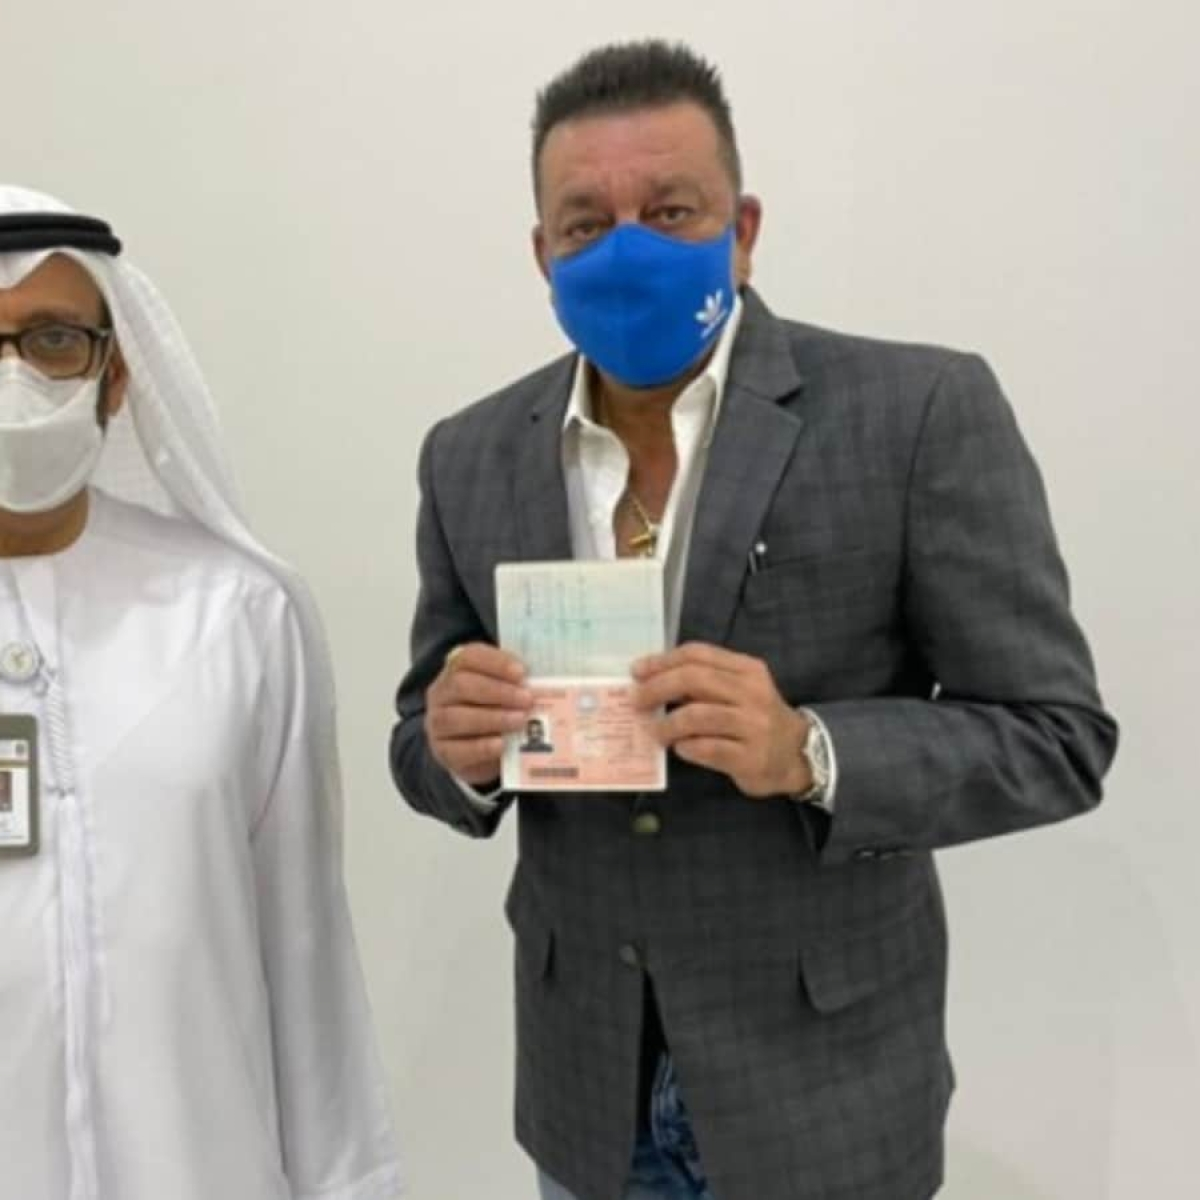 Sanjay Dutt receives a golden visa for the UAE, expresses gratitude